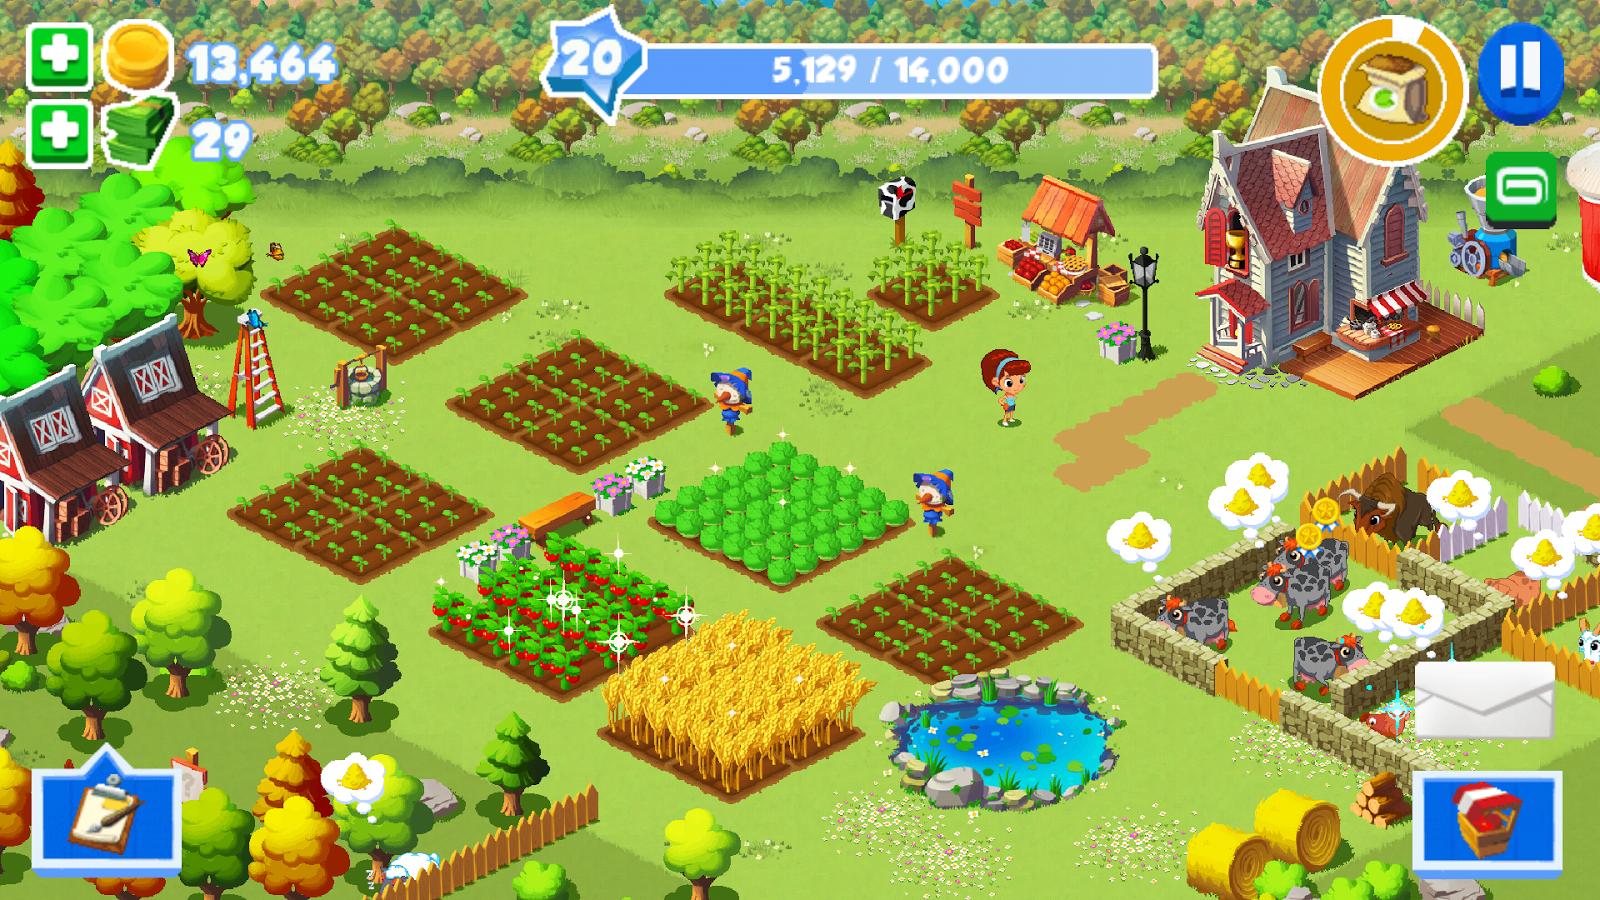 Green Farm 3: My Farm